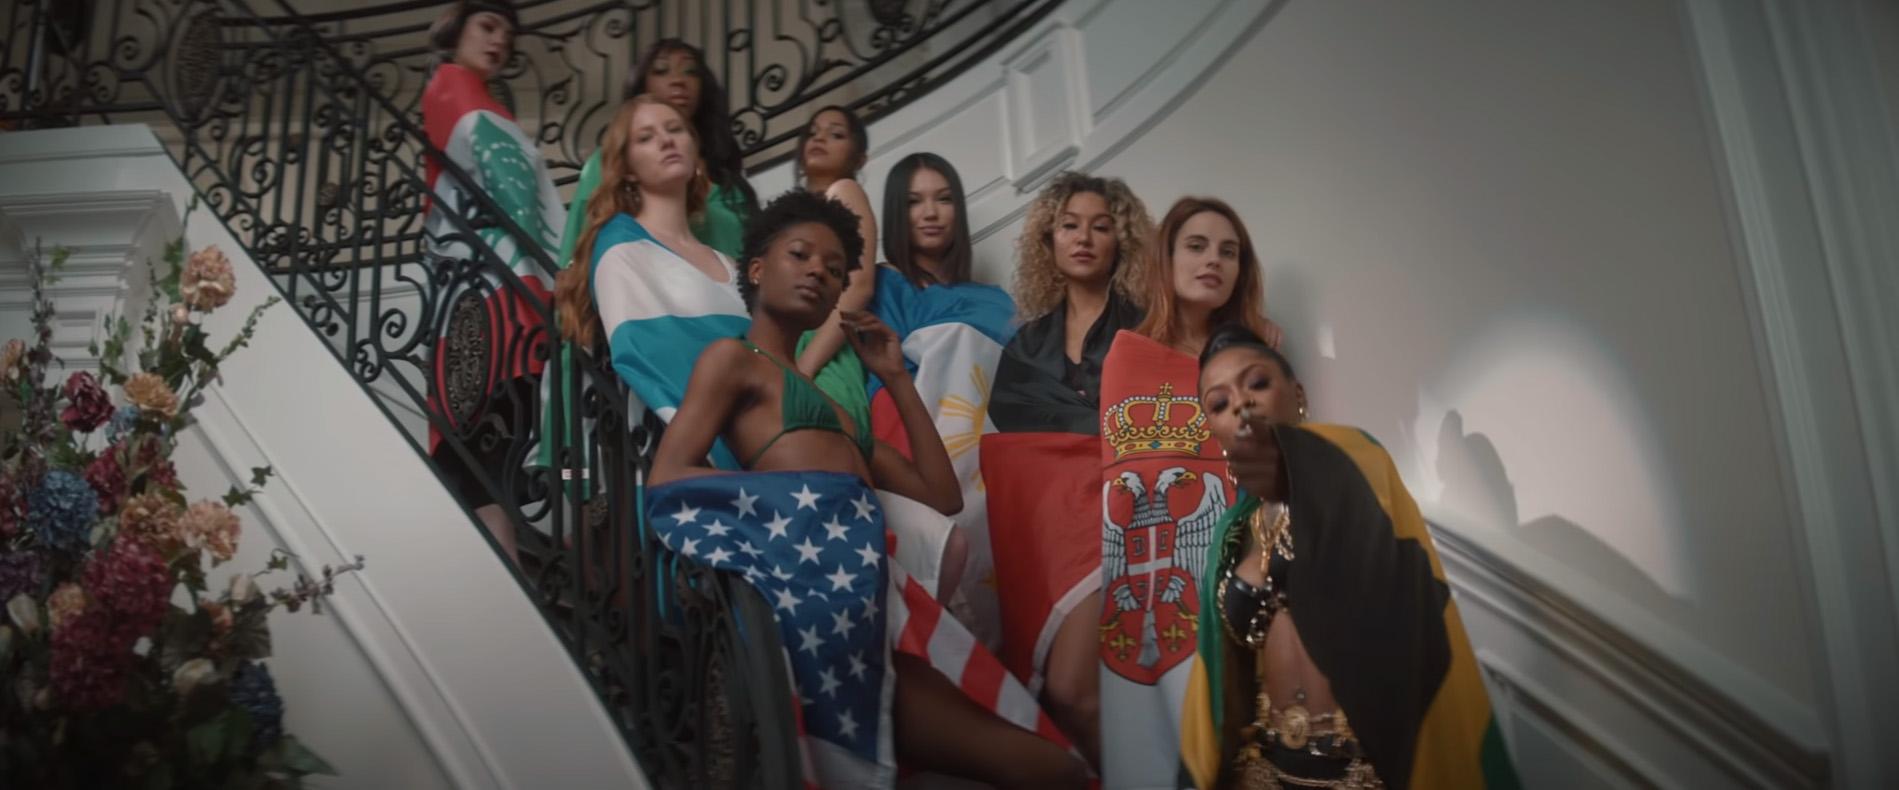 HoodCelebrityy & Kash Doll - So Pretty (Video) - 1VIBE